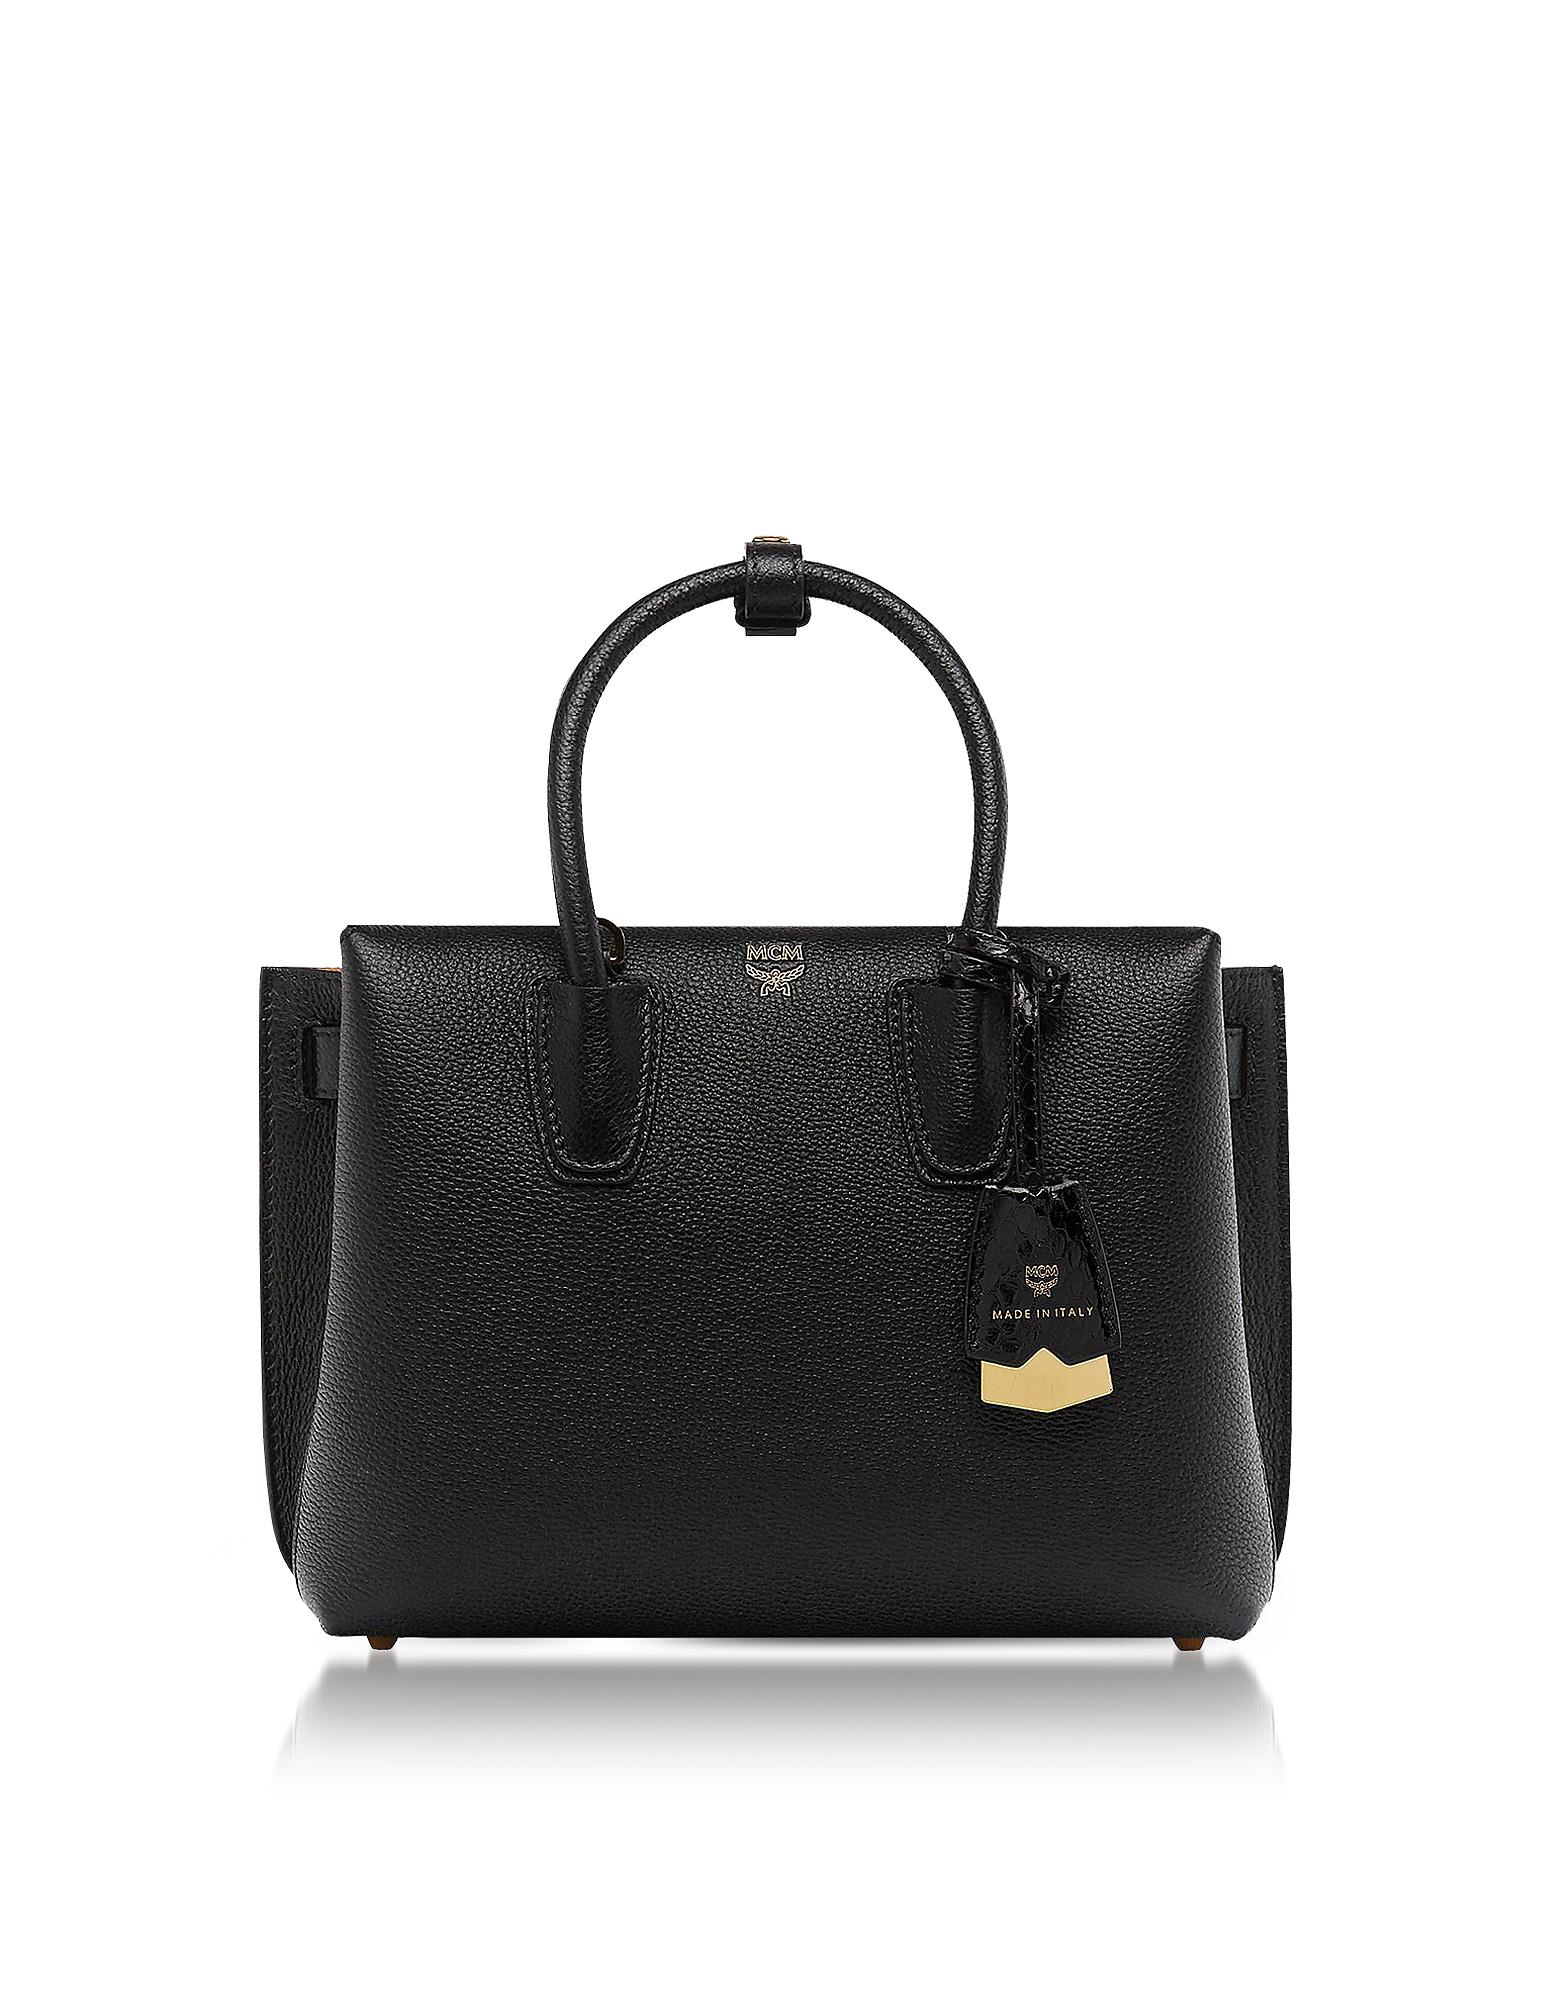 MCM Handbags, Black Leather Milla Small Tote